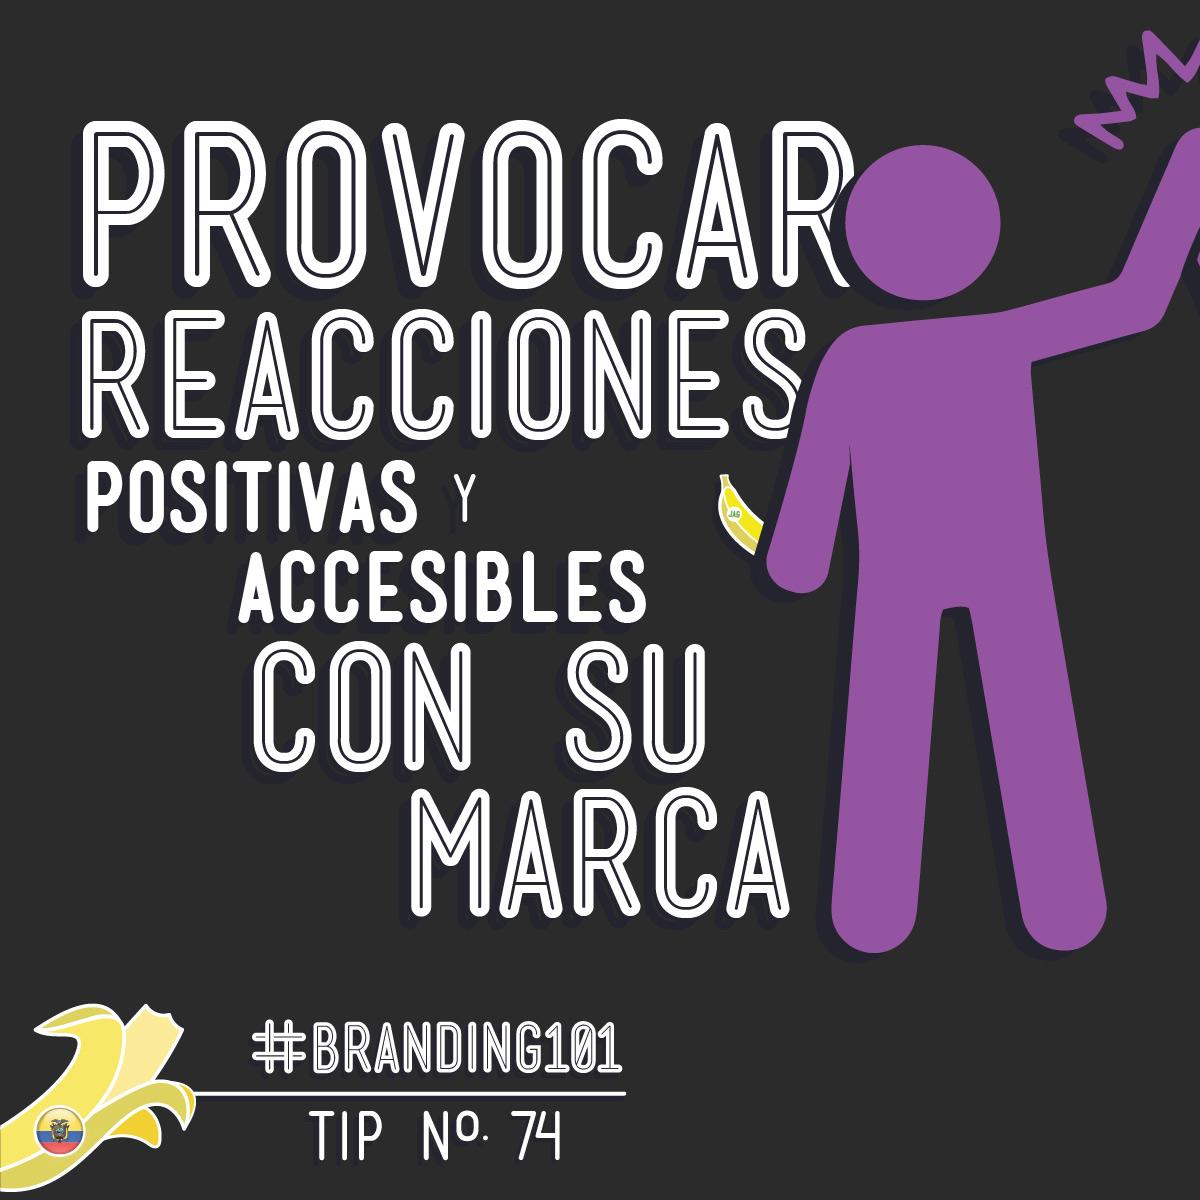 jag-branding-provoke-reactions-ES.jpg